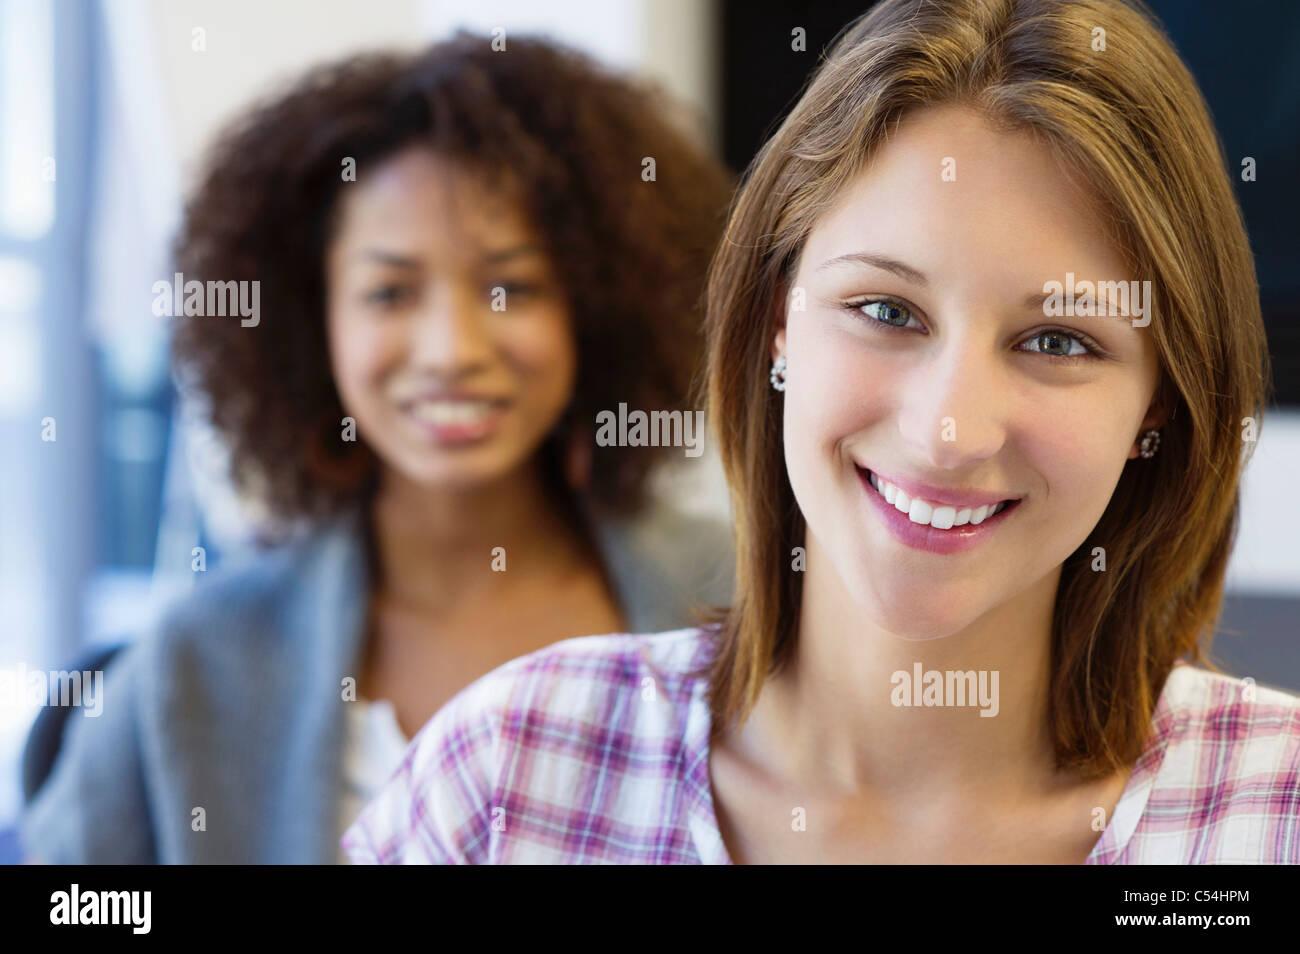 Portrait de deux femmes sitting in classroom and smiling Photo Stock